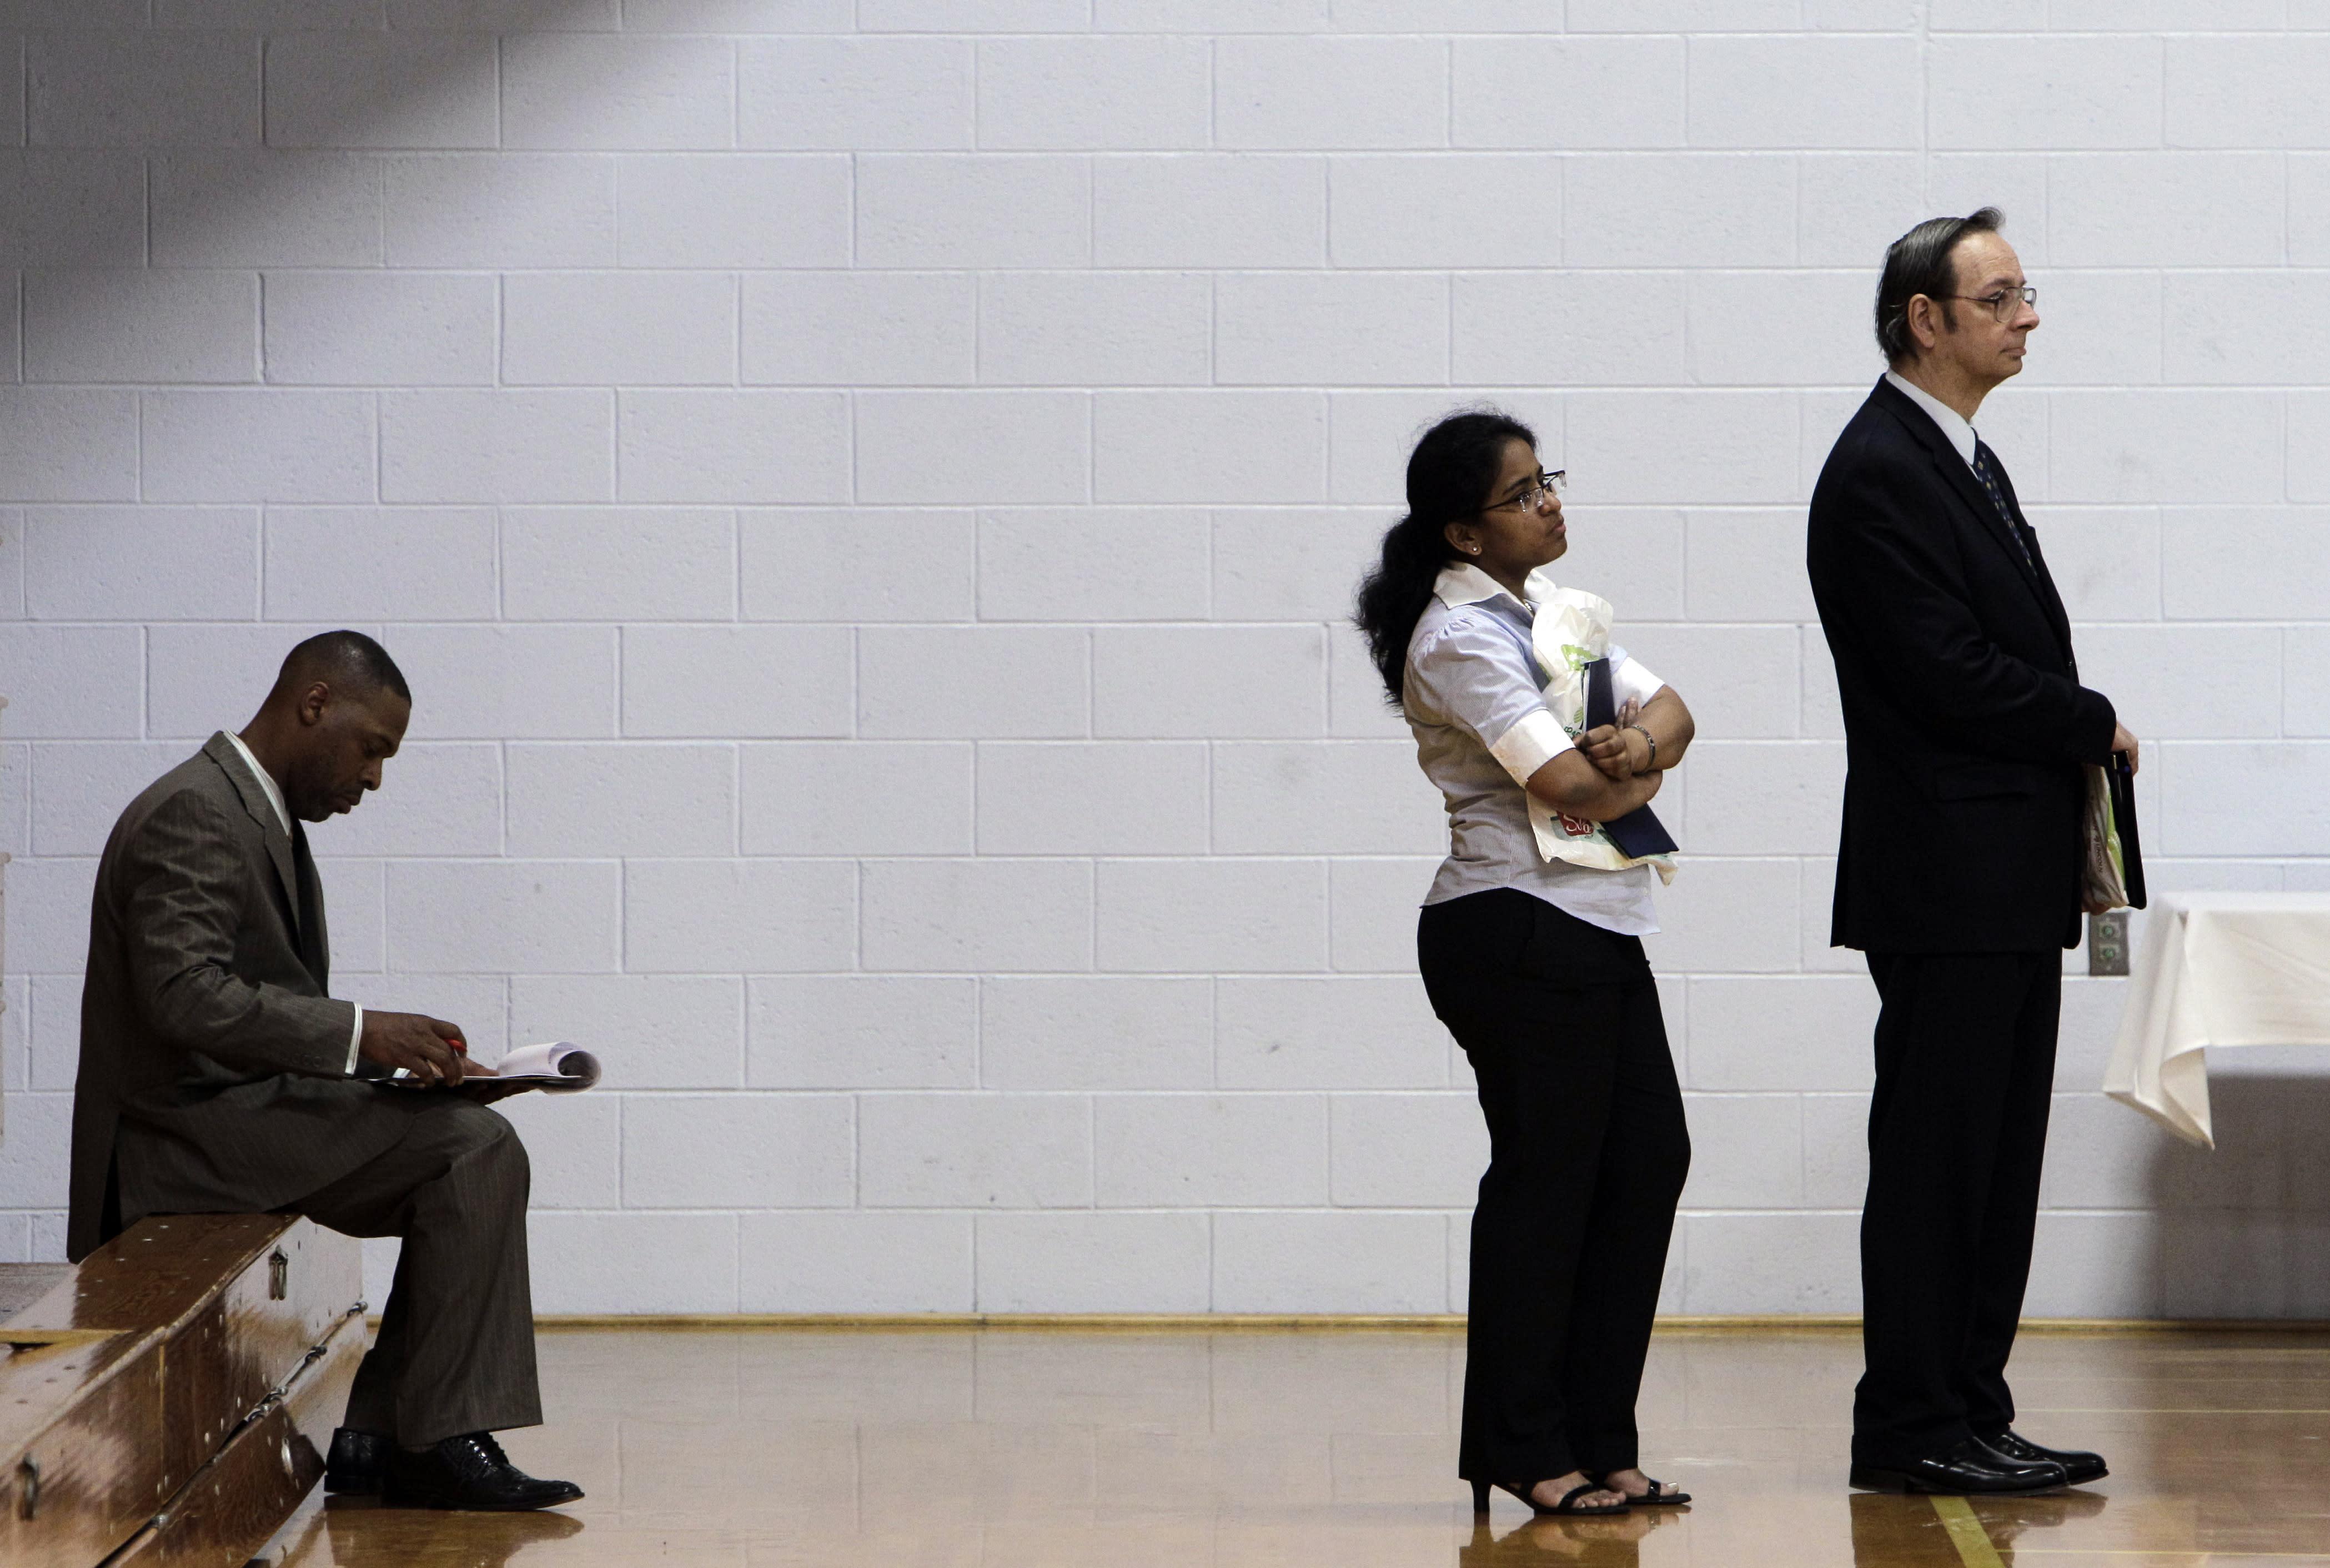 AP IMPACT: Recession, tech kill middle-class jobs